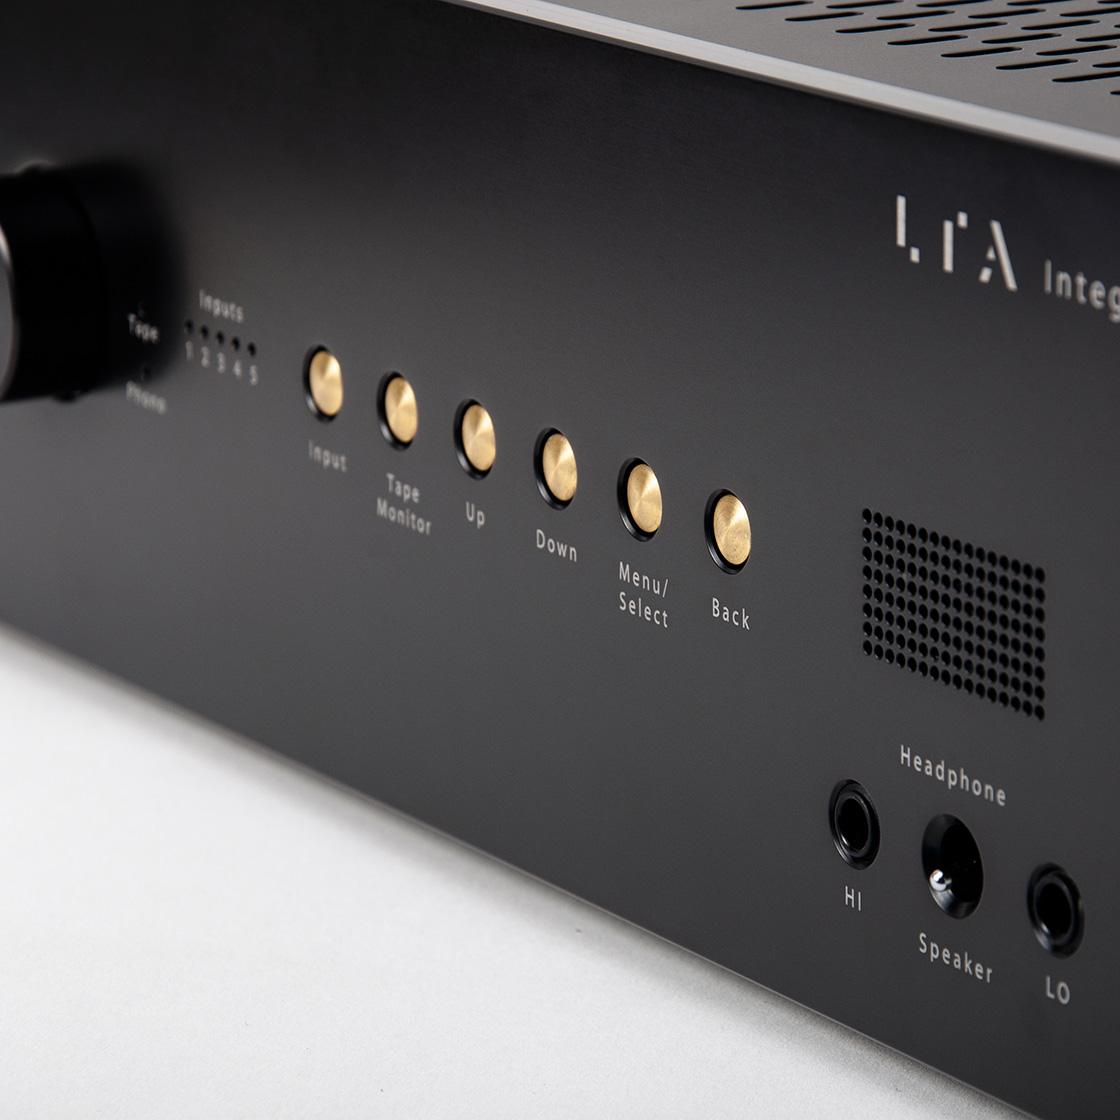 LTA+Integrated+Amp+Detail.jpg